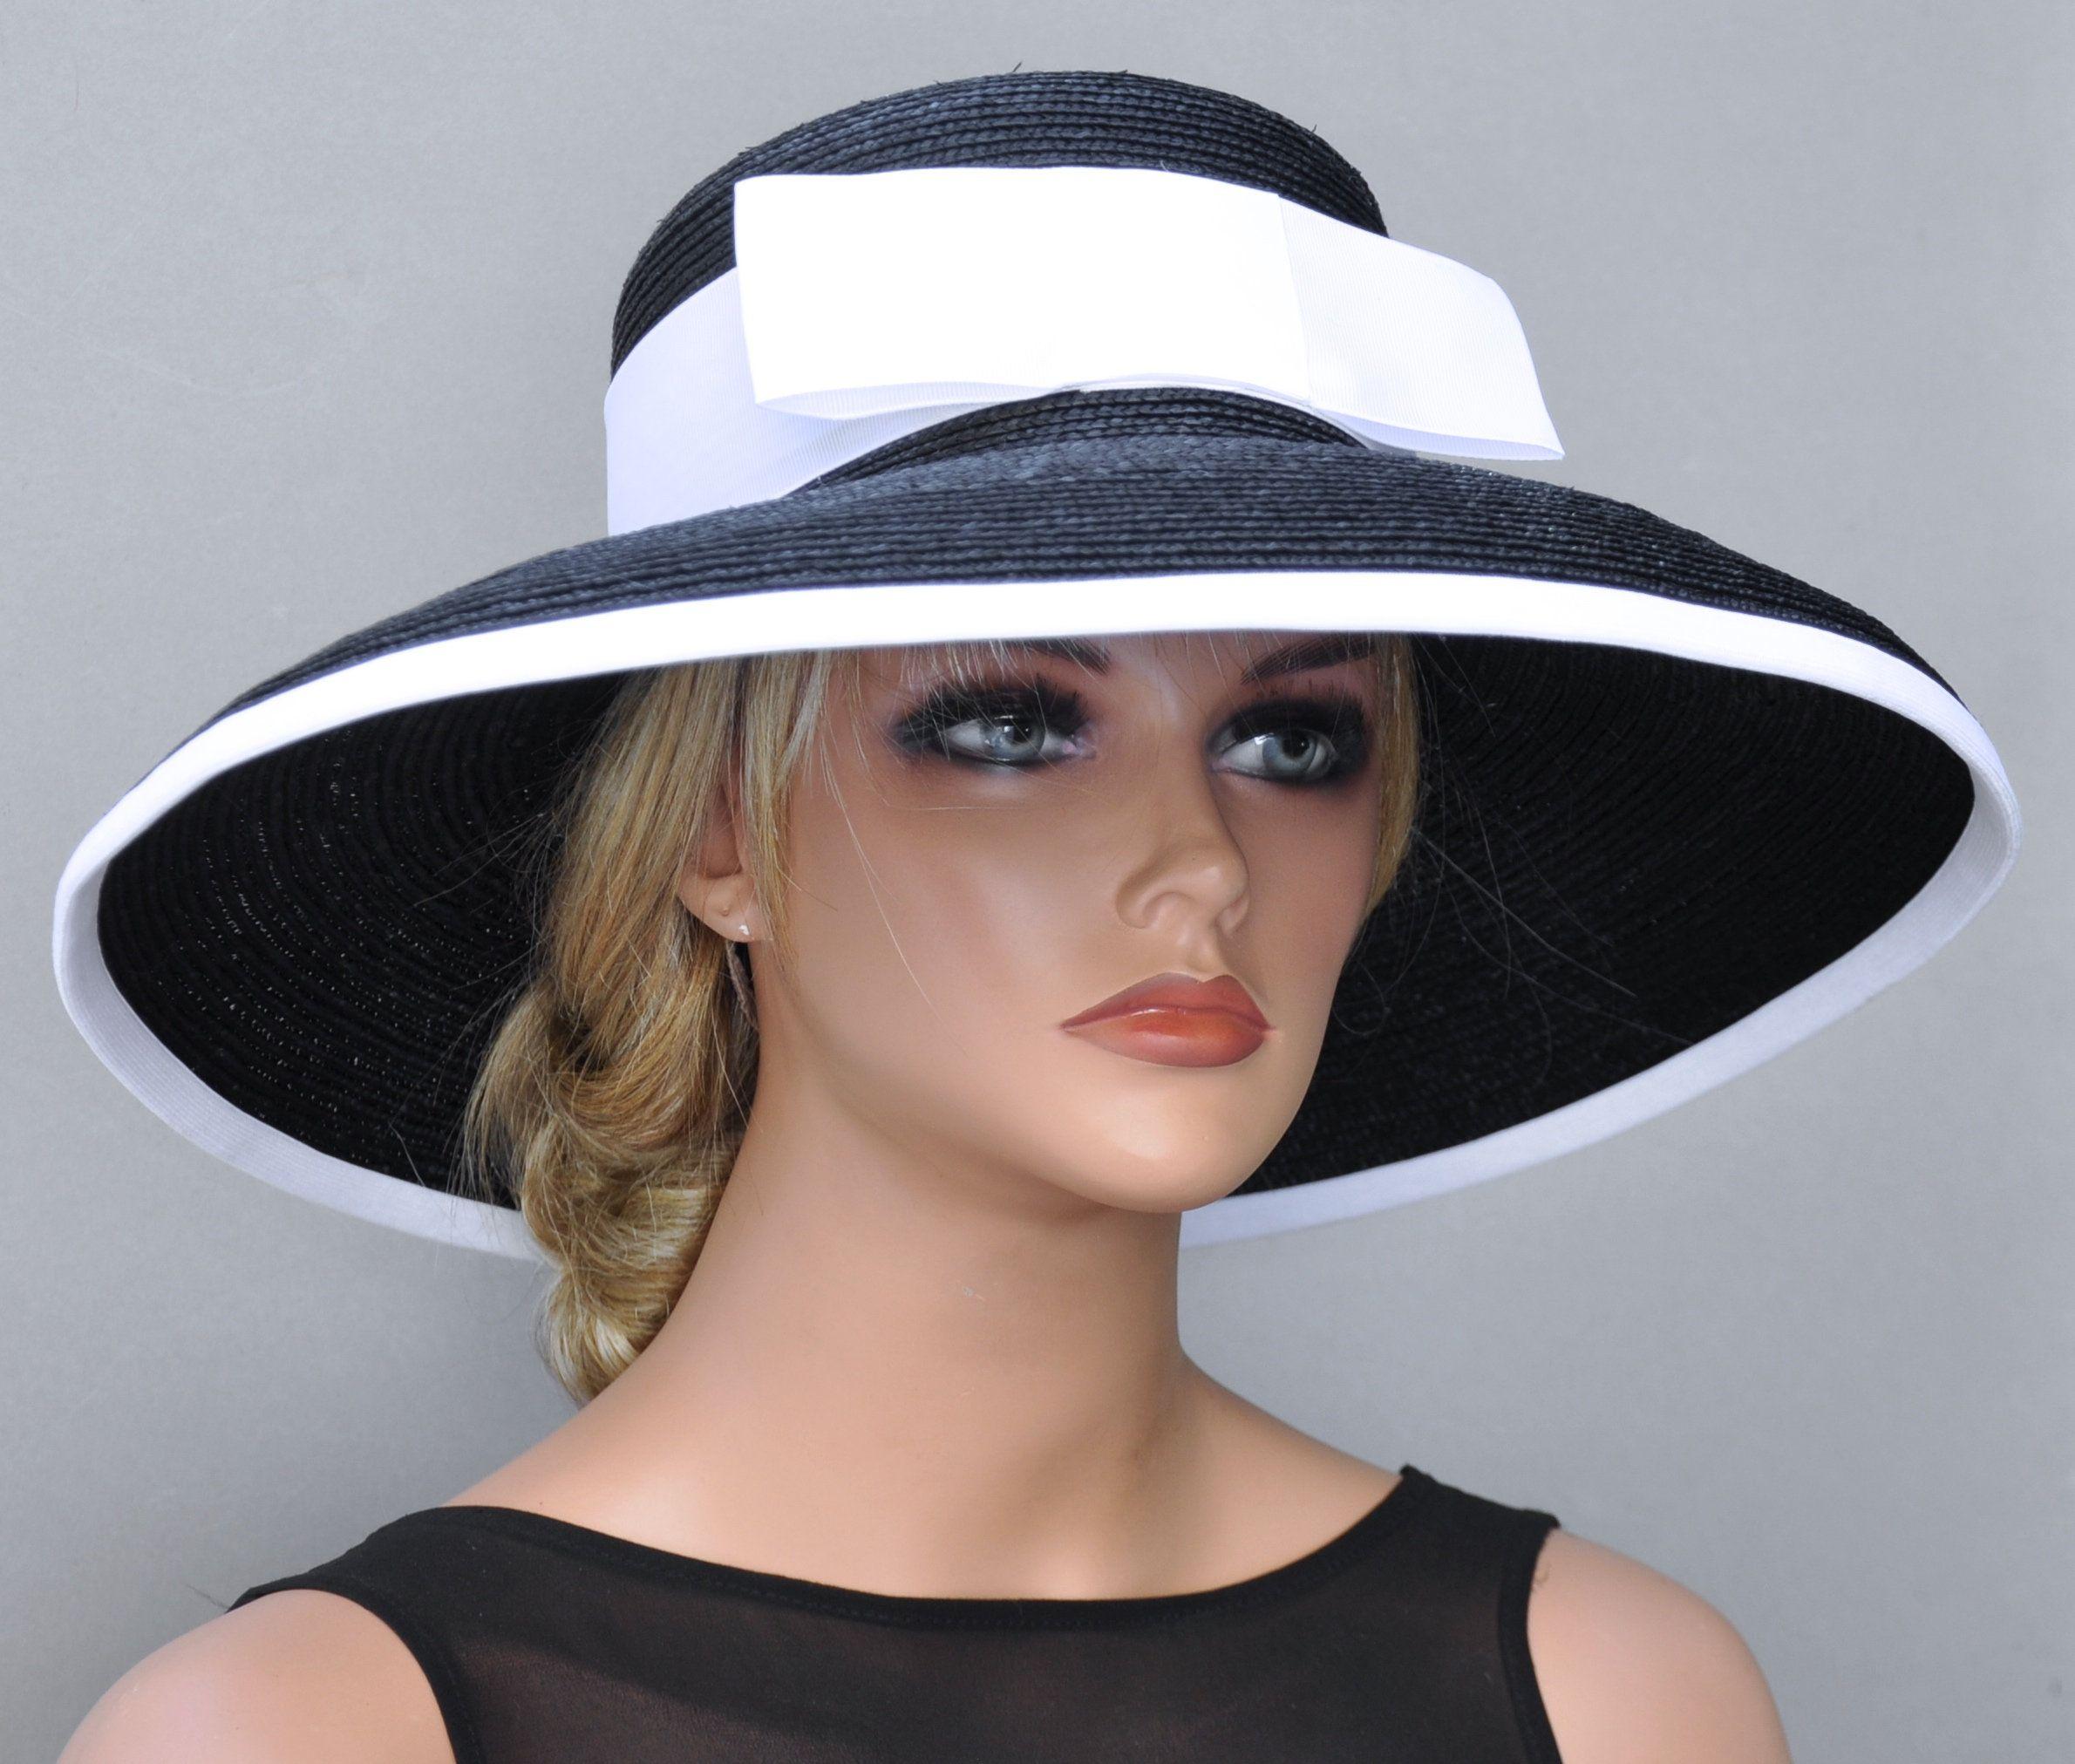 6cd1d71f610f2 Ladies Black or Navy Hat, Black & White Hat, Navy and White Hat, Wedding  Hat, Church Hat, Wide Brim Hat Audrey Hepburn Hat Formal Dressy Hat